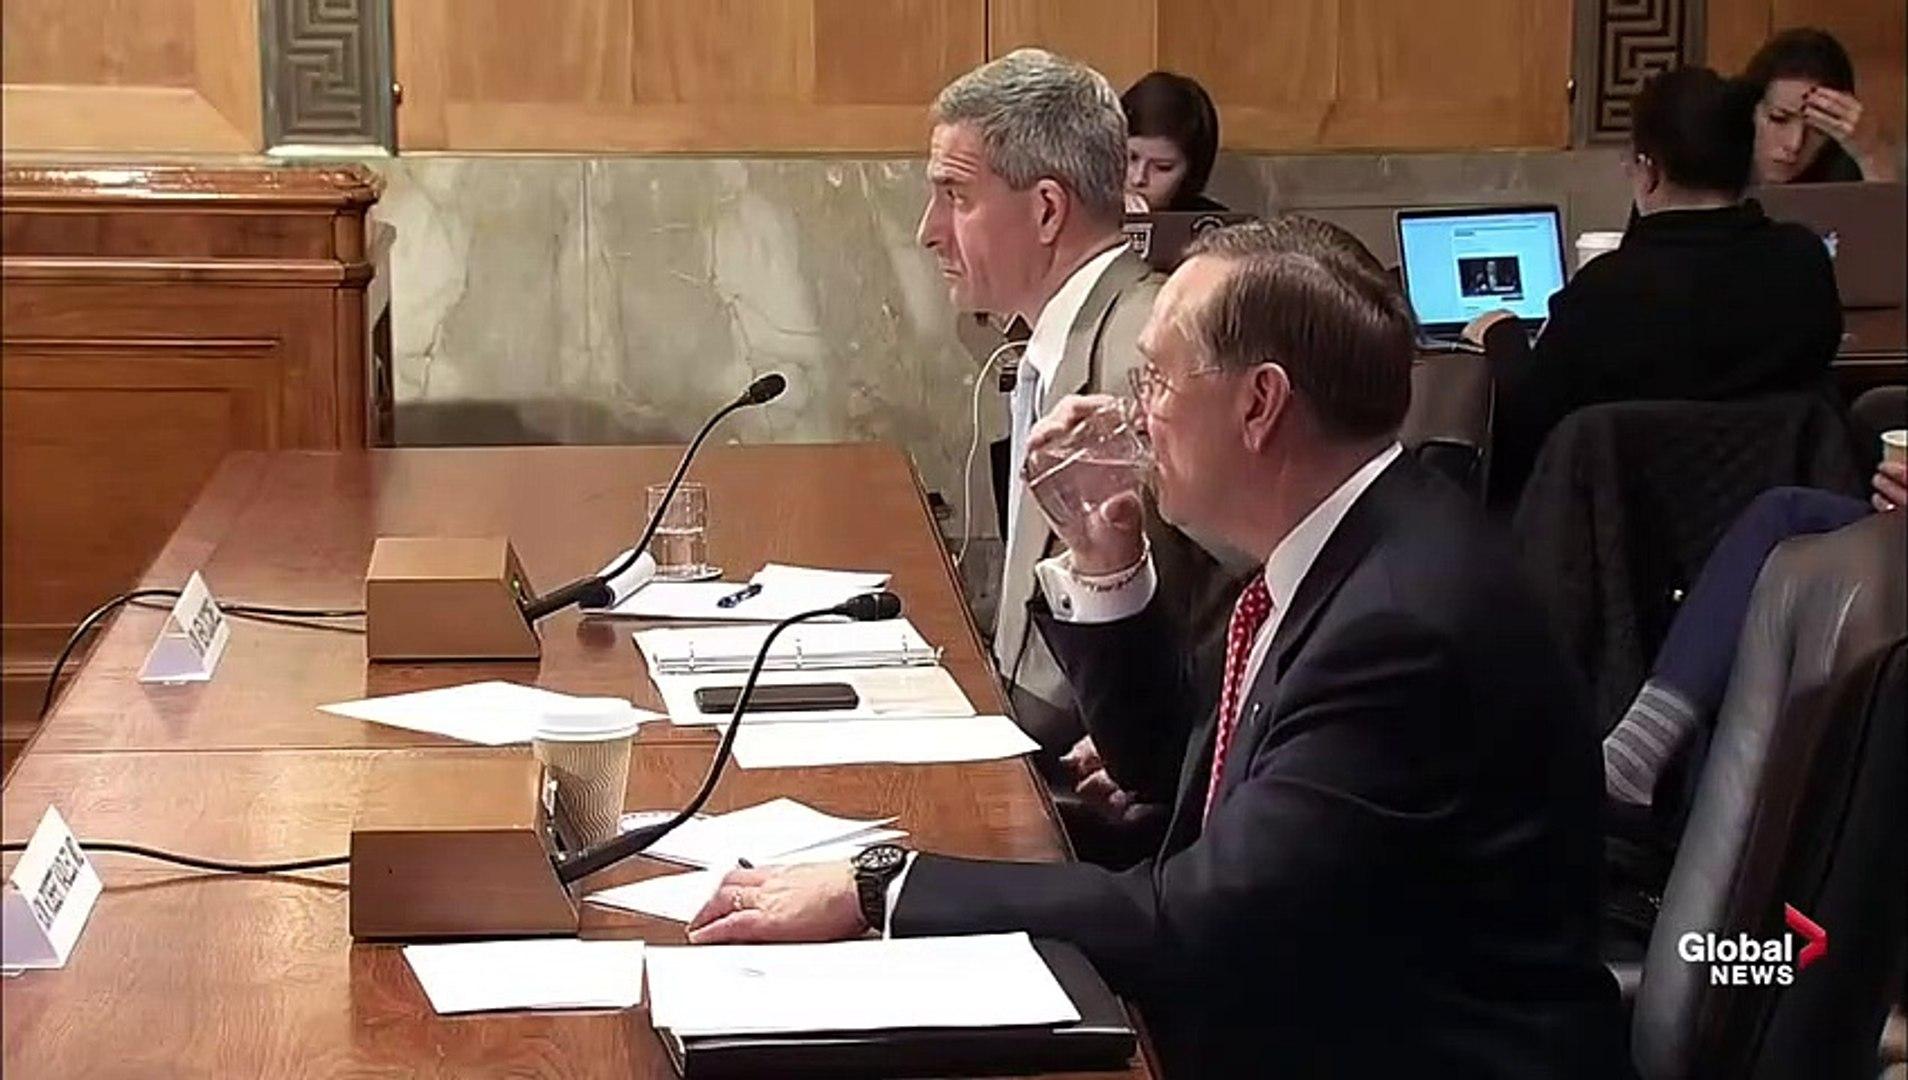 Coronavirus outbreak- U.S. Senate Homeland Security committee hearing on COVID-19 containment - FULL